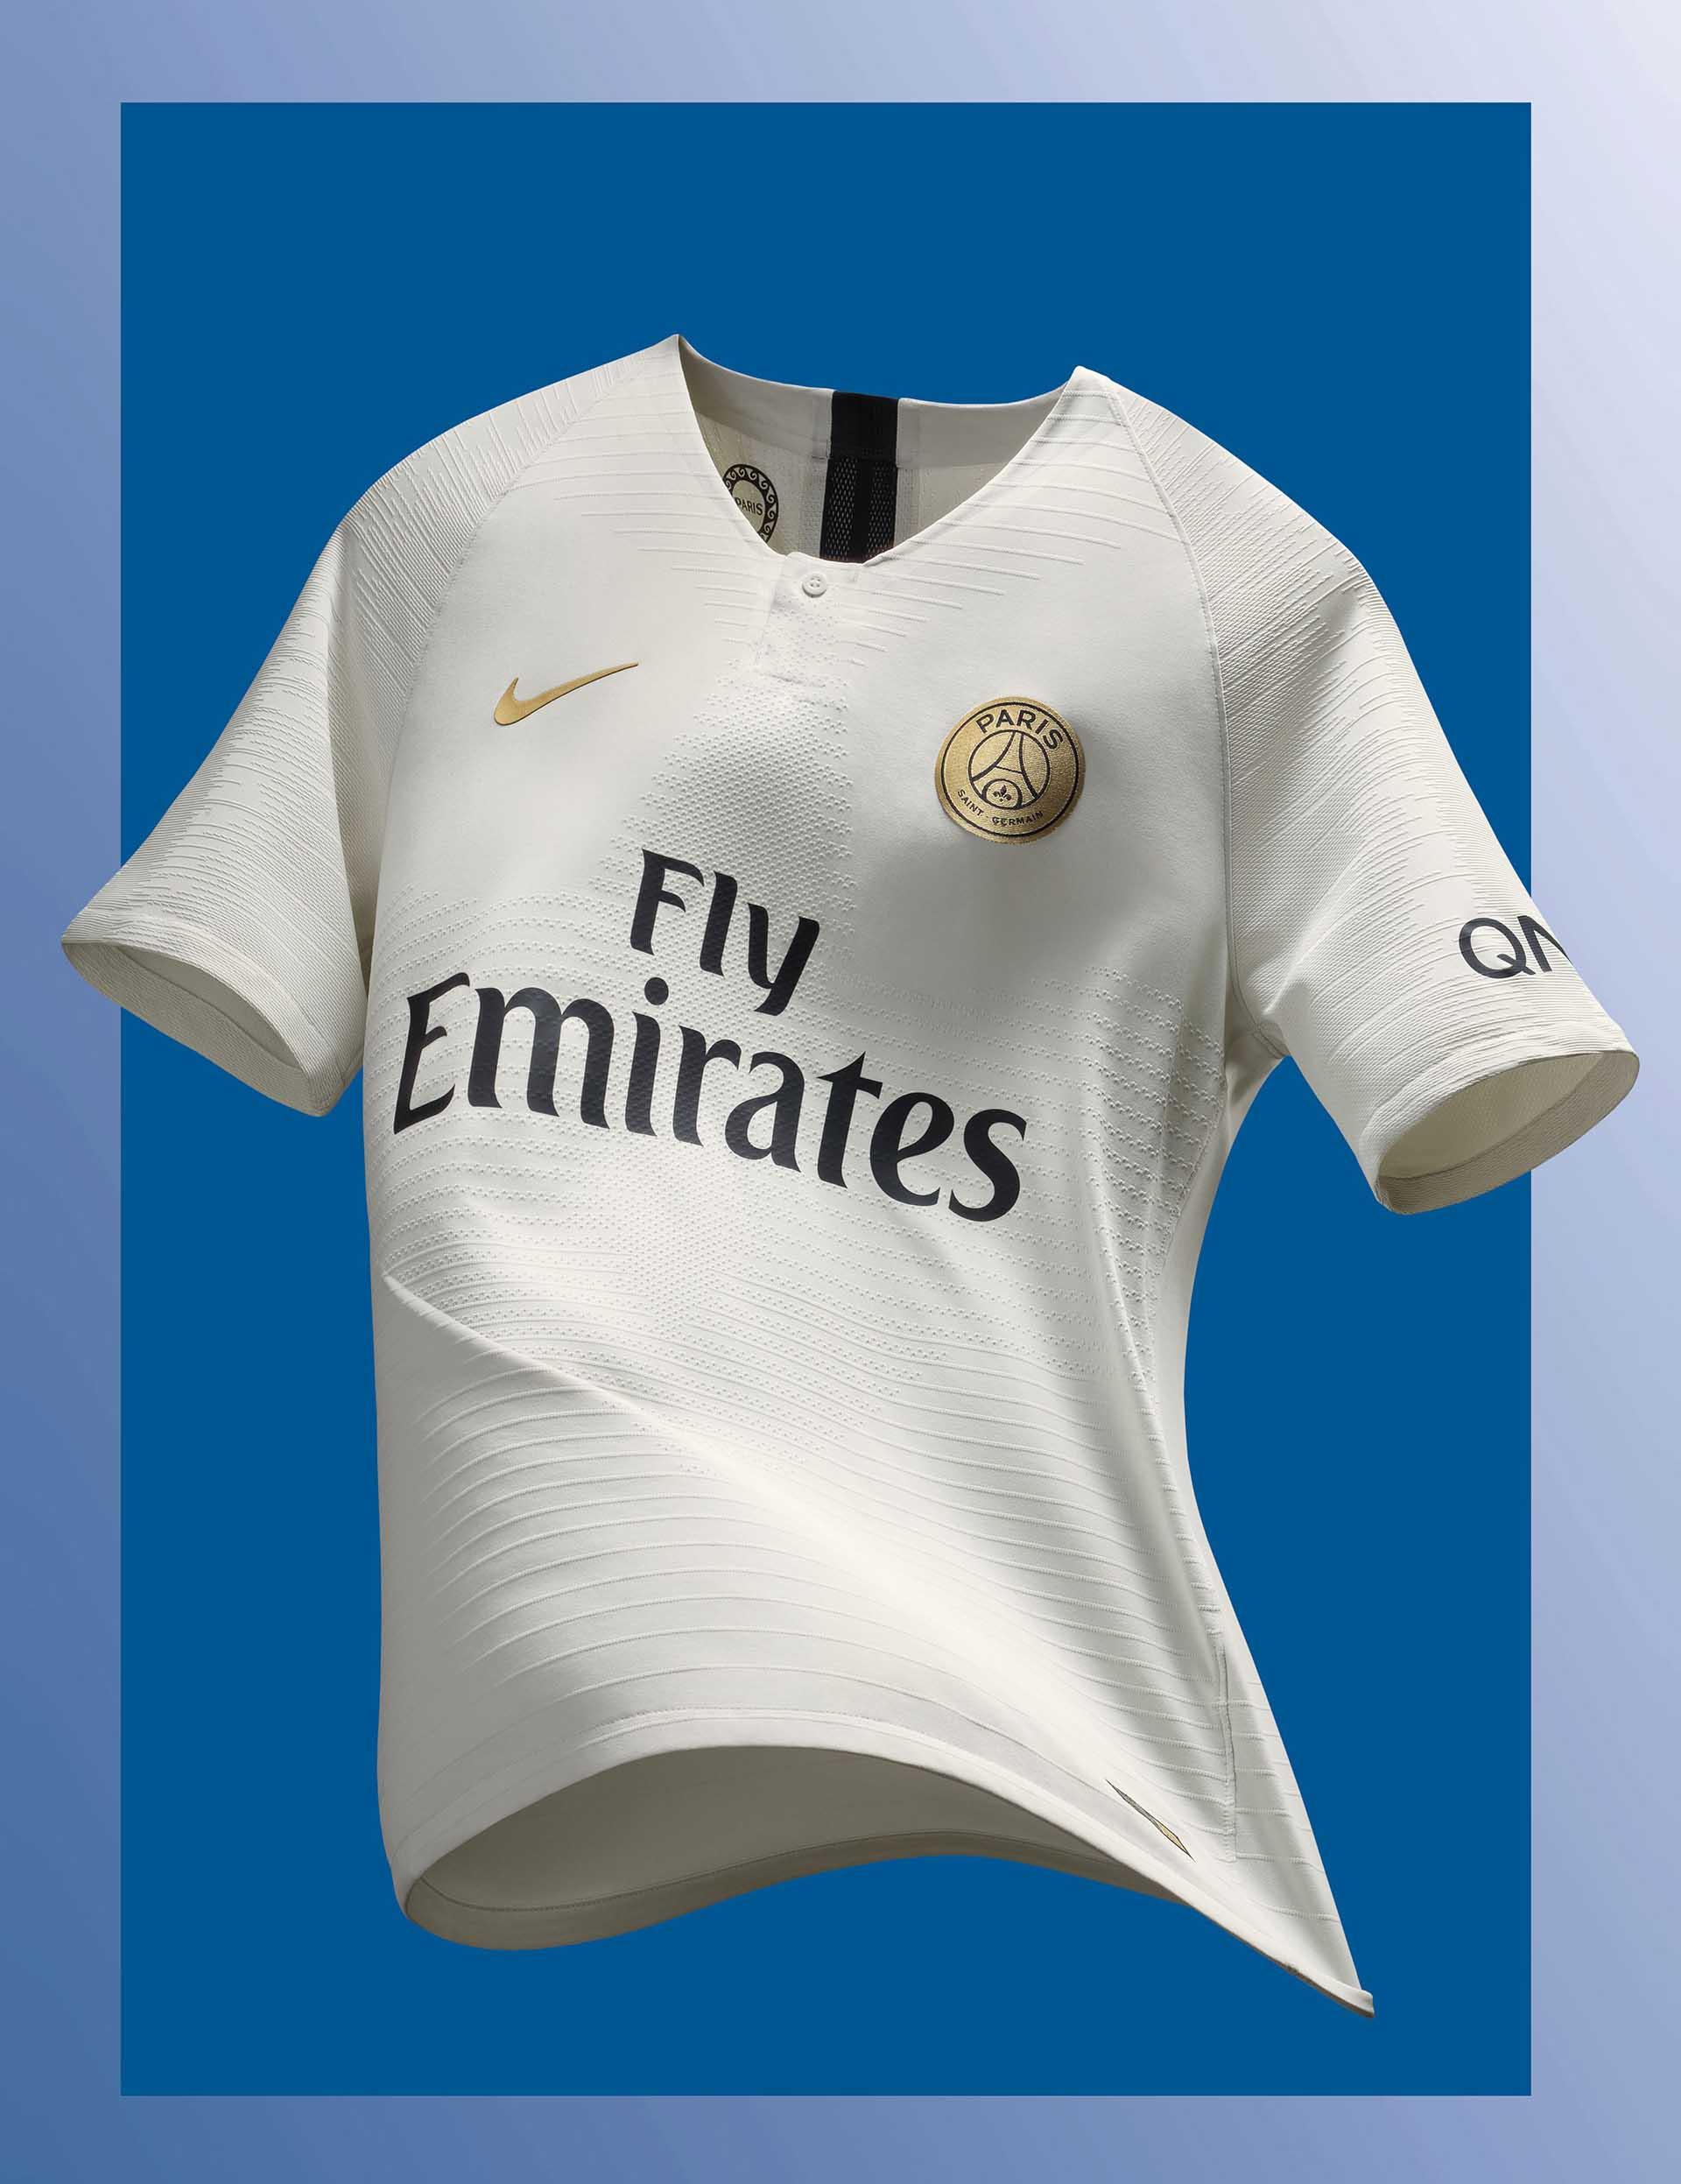 e86d0d51f Nike Launch The PSG 18 19 Away Shirt - SoccerBible